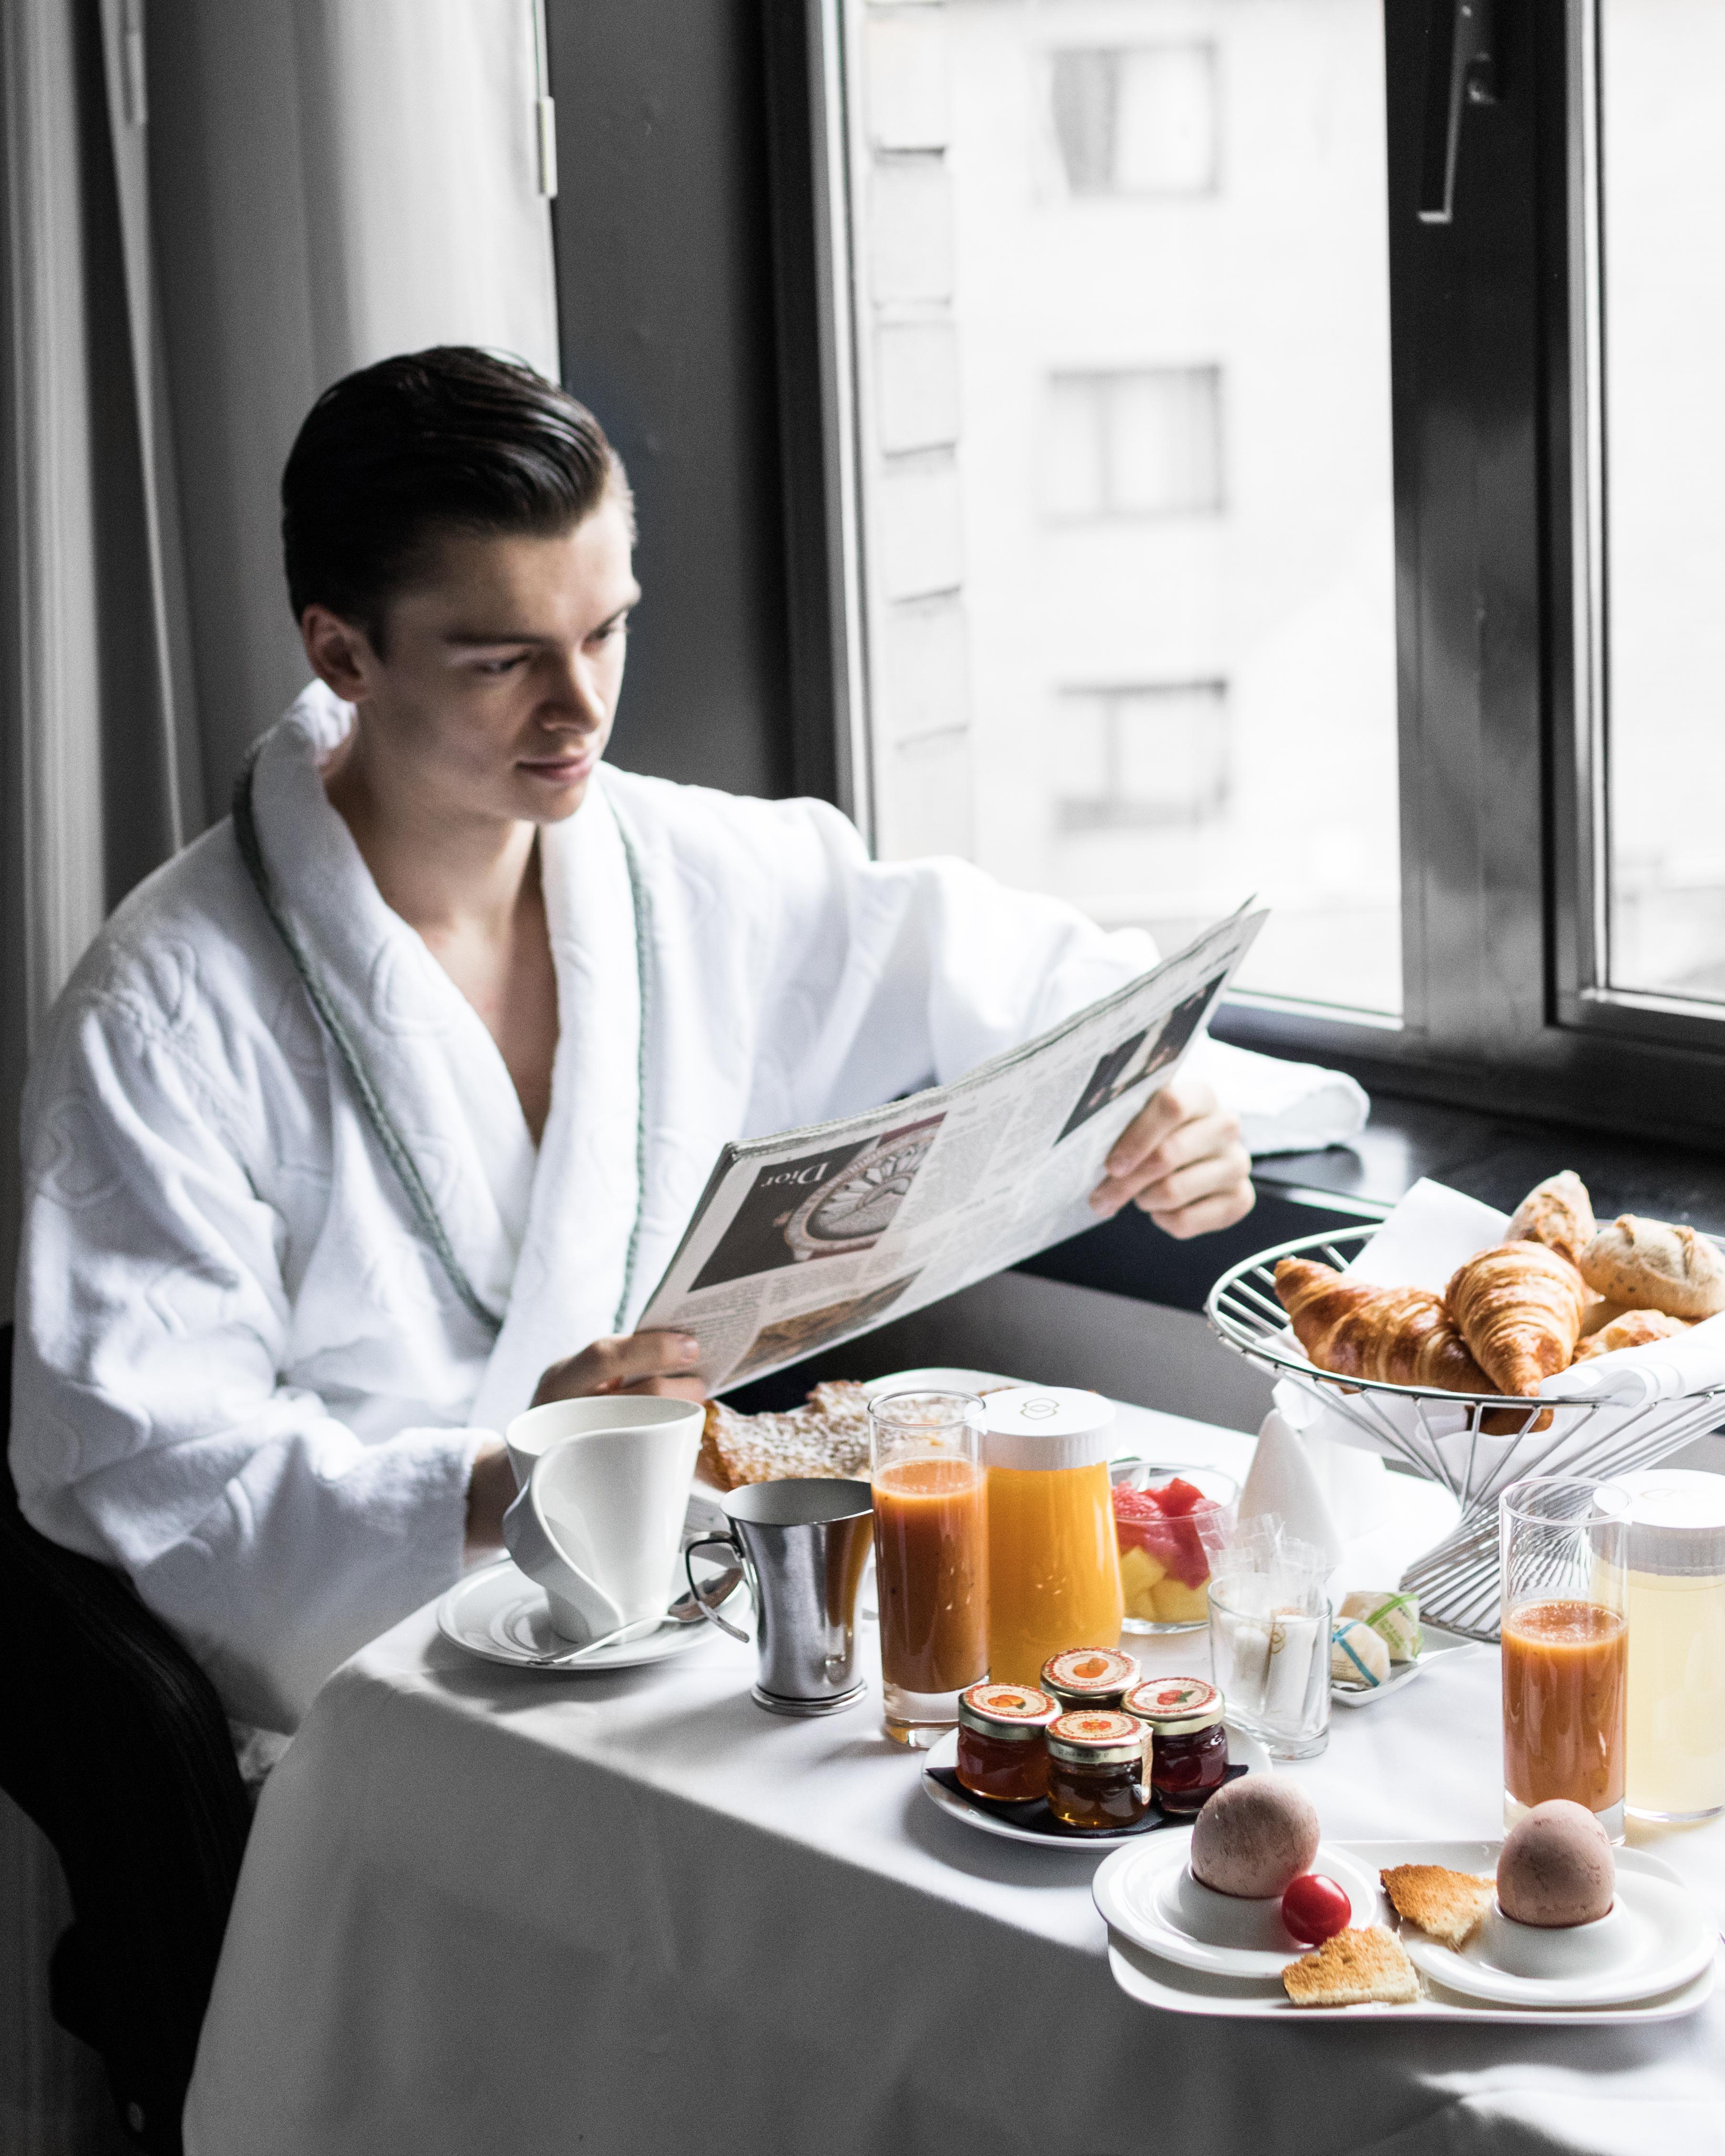 Mathias le fevre - sofitel le louise brussels breakfast room service gentleman luxury hotel